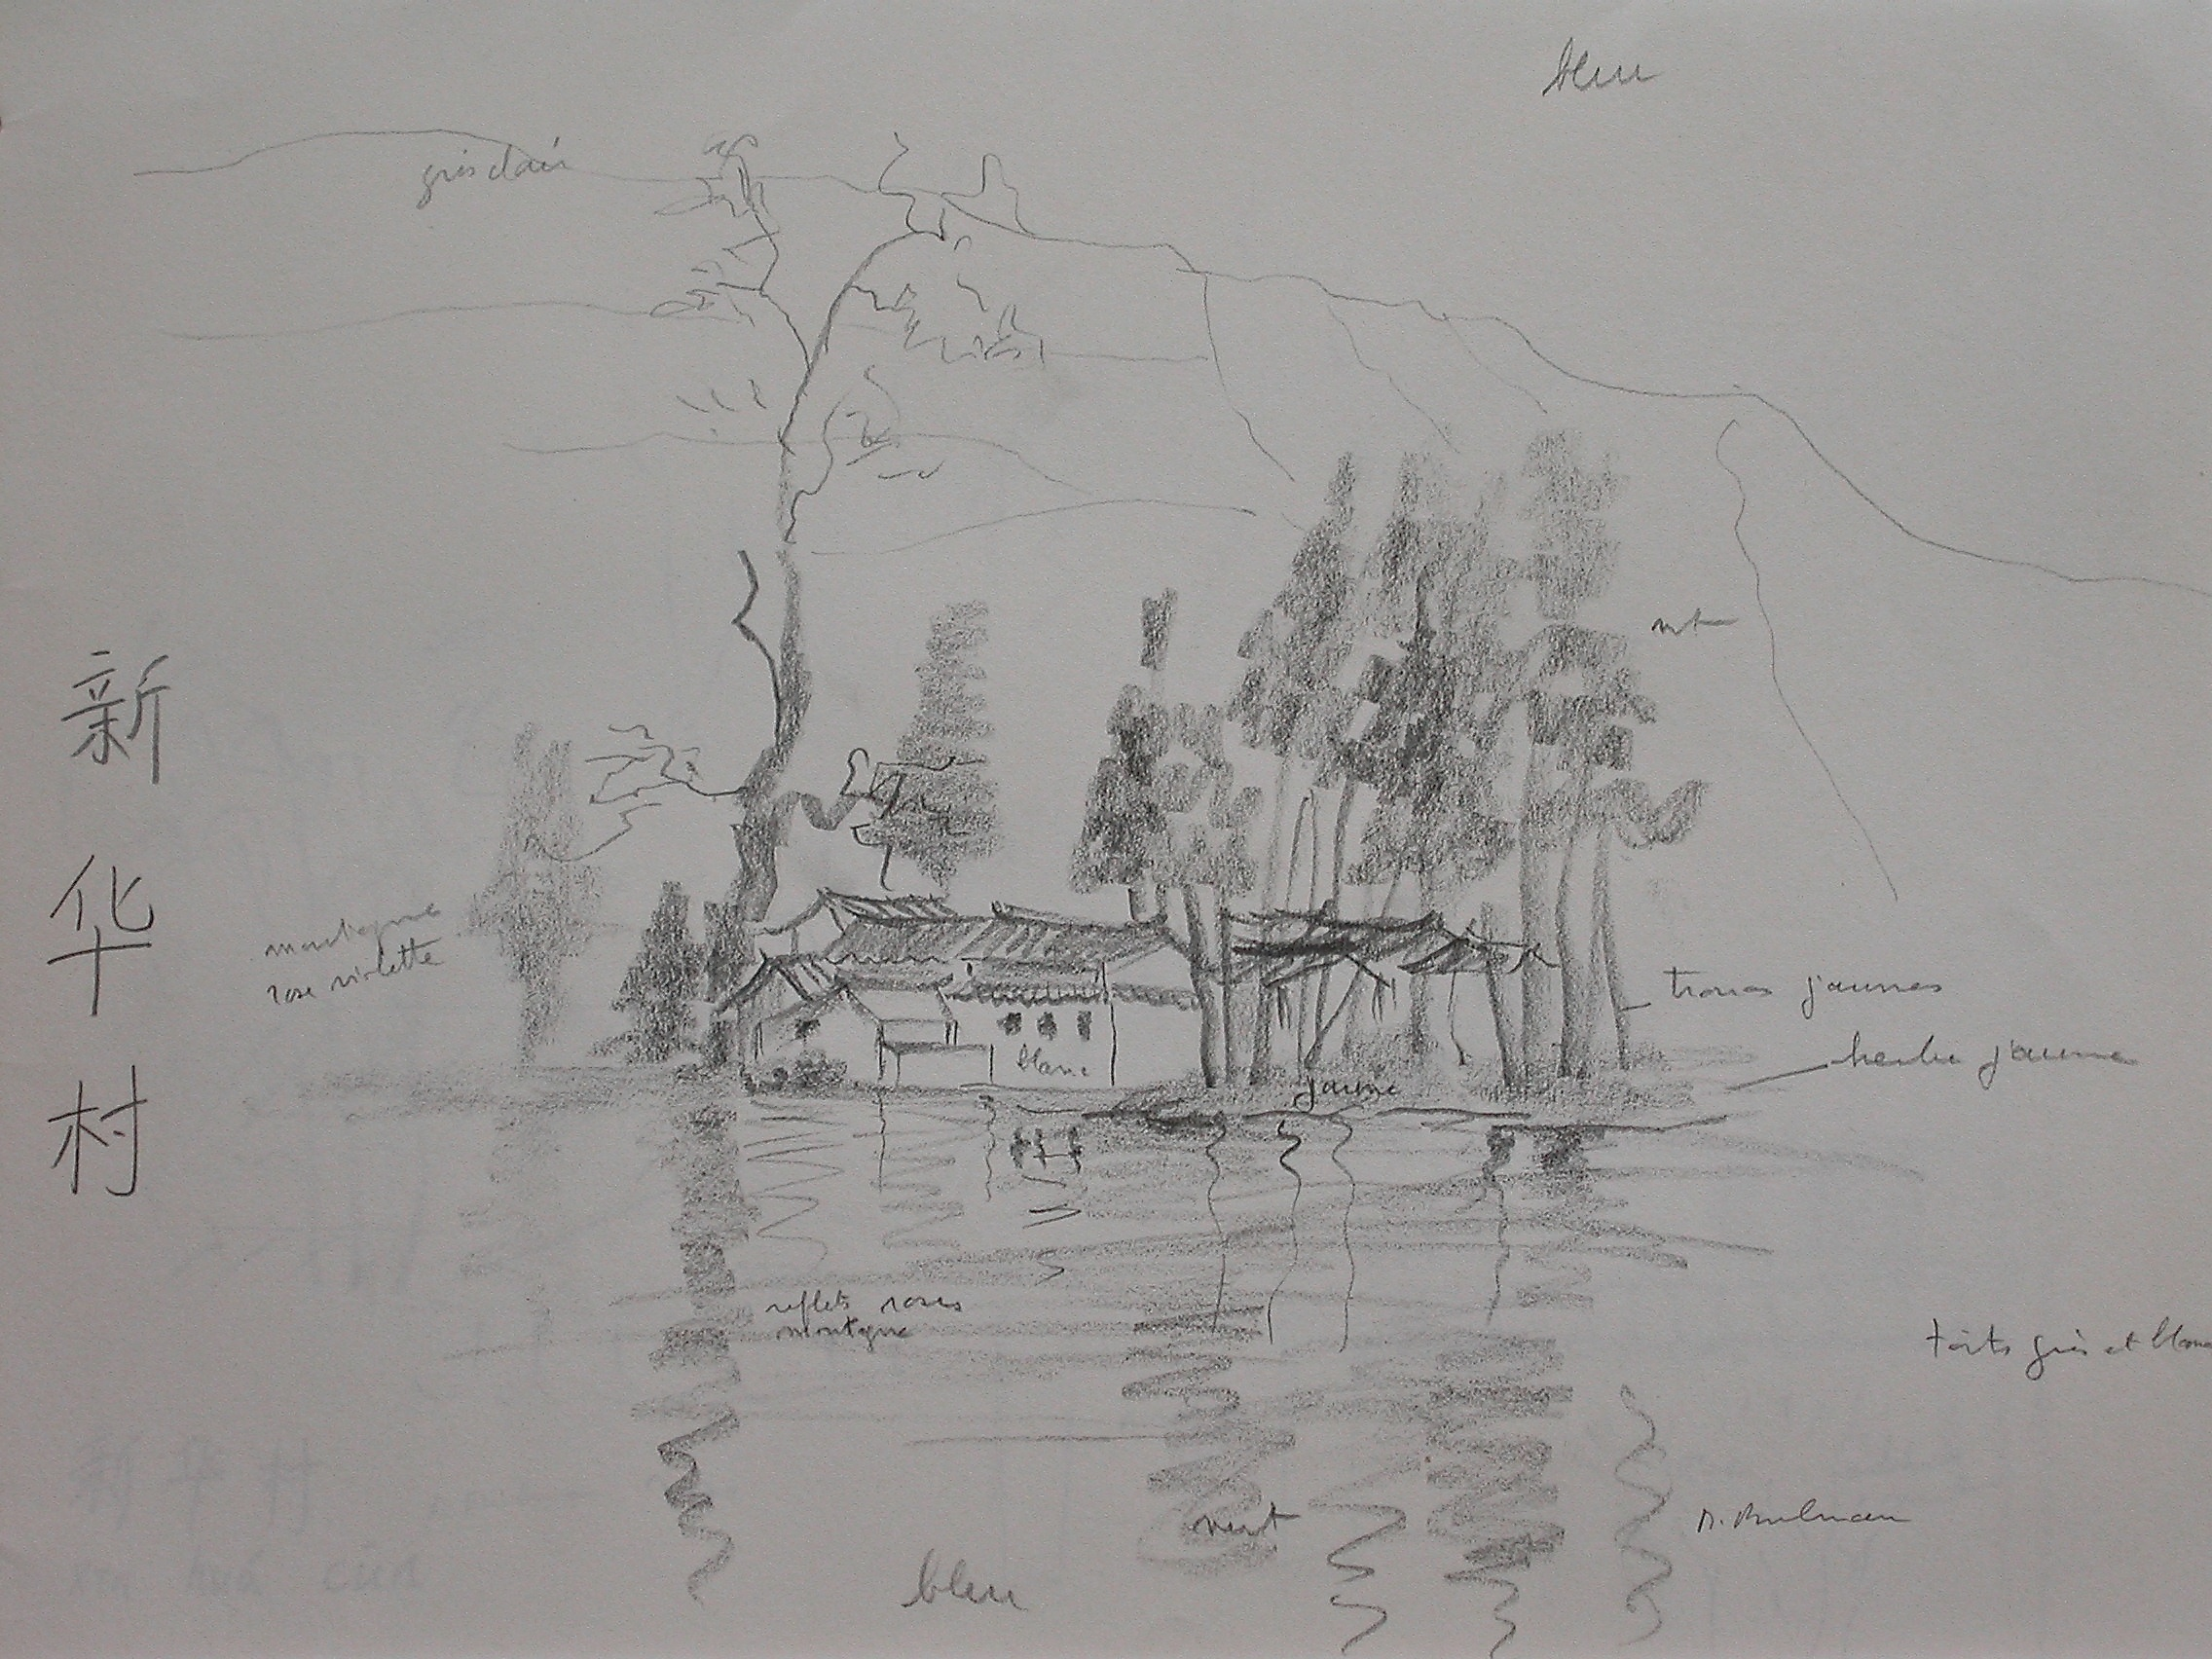 Village at waterfront